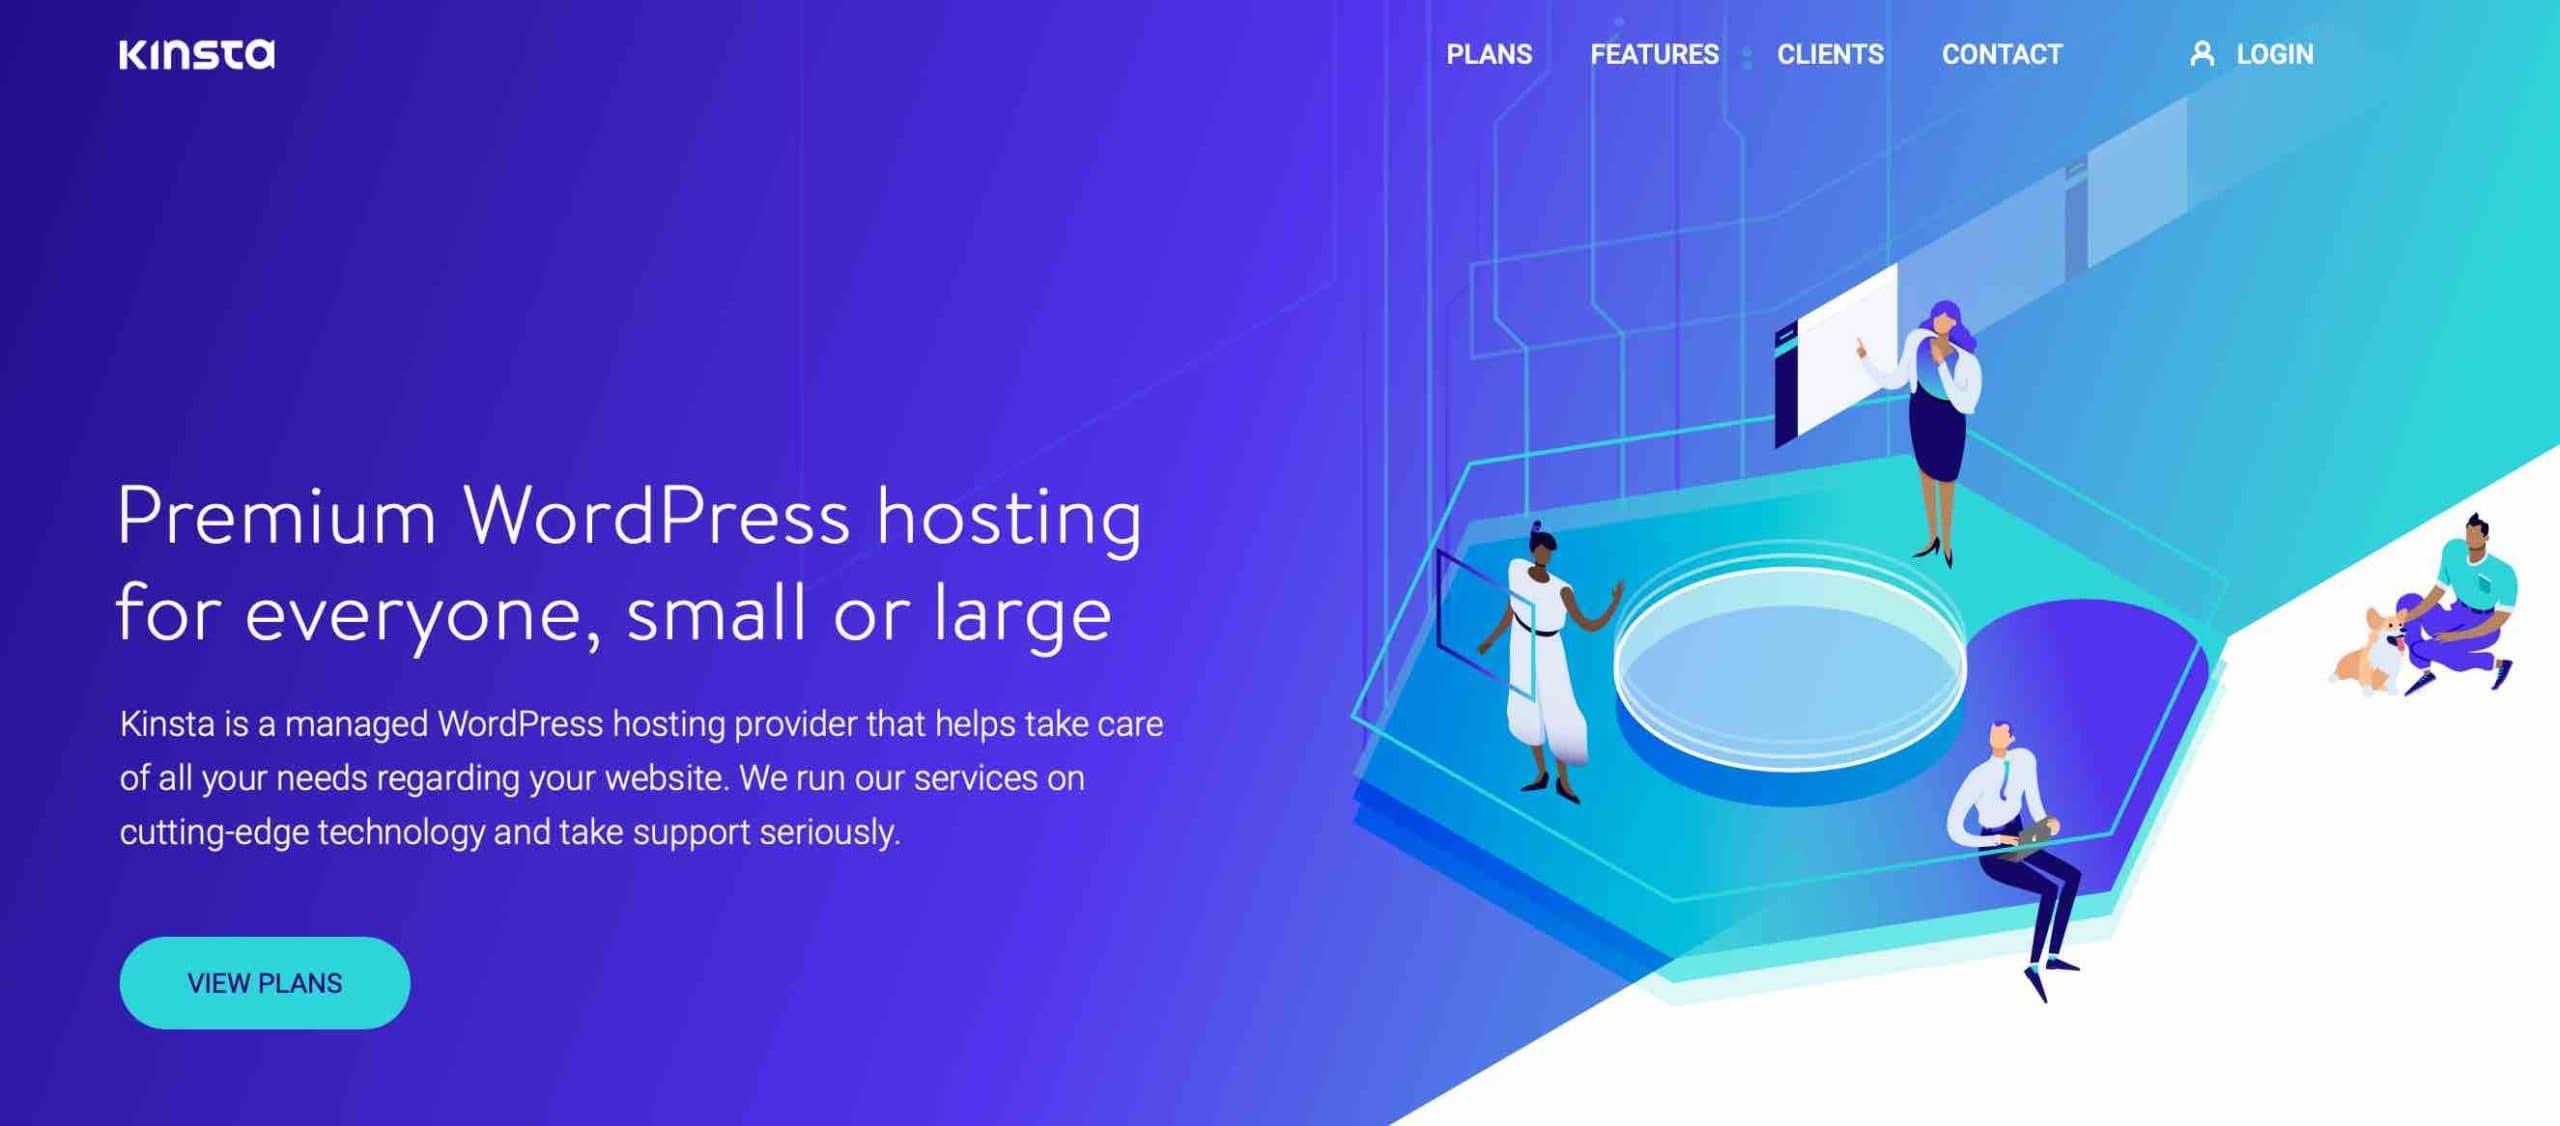 Cloudways alternative Kinsta is a Premium WordPress hosting for everyone